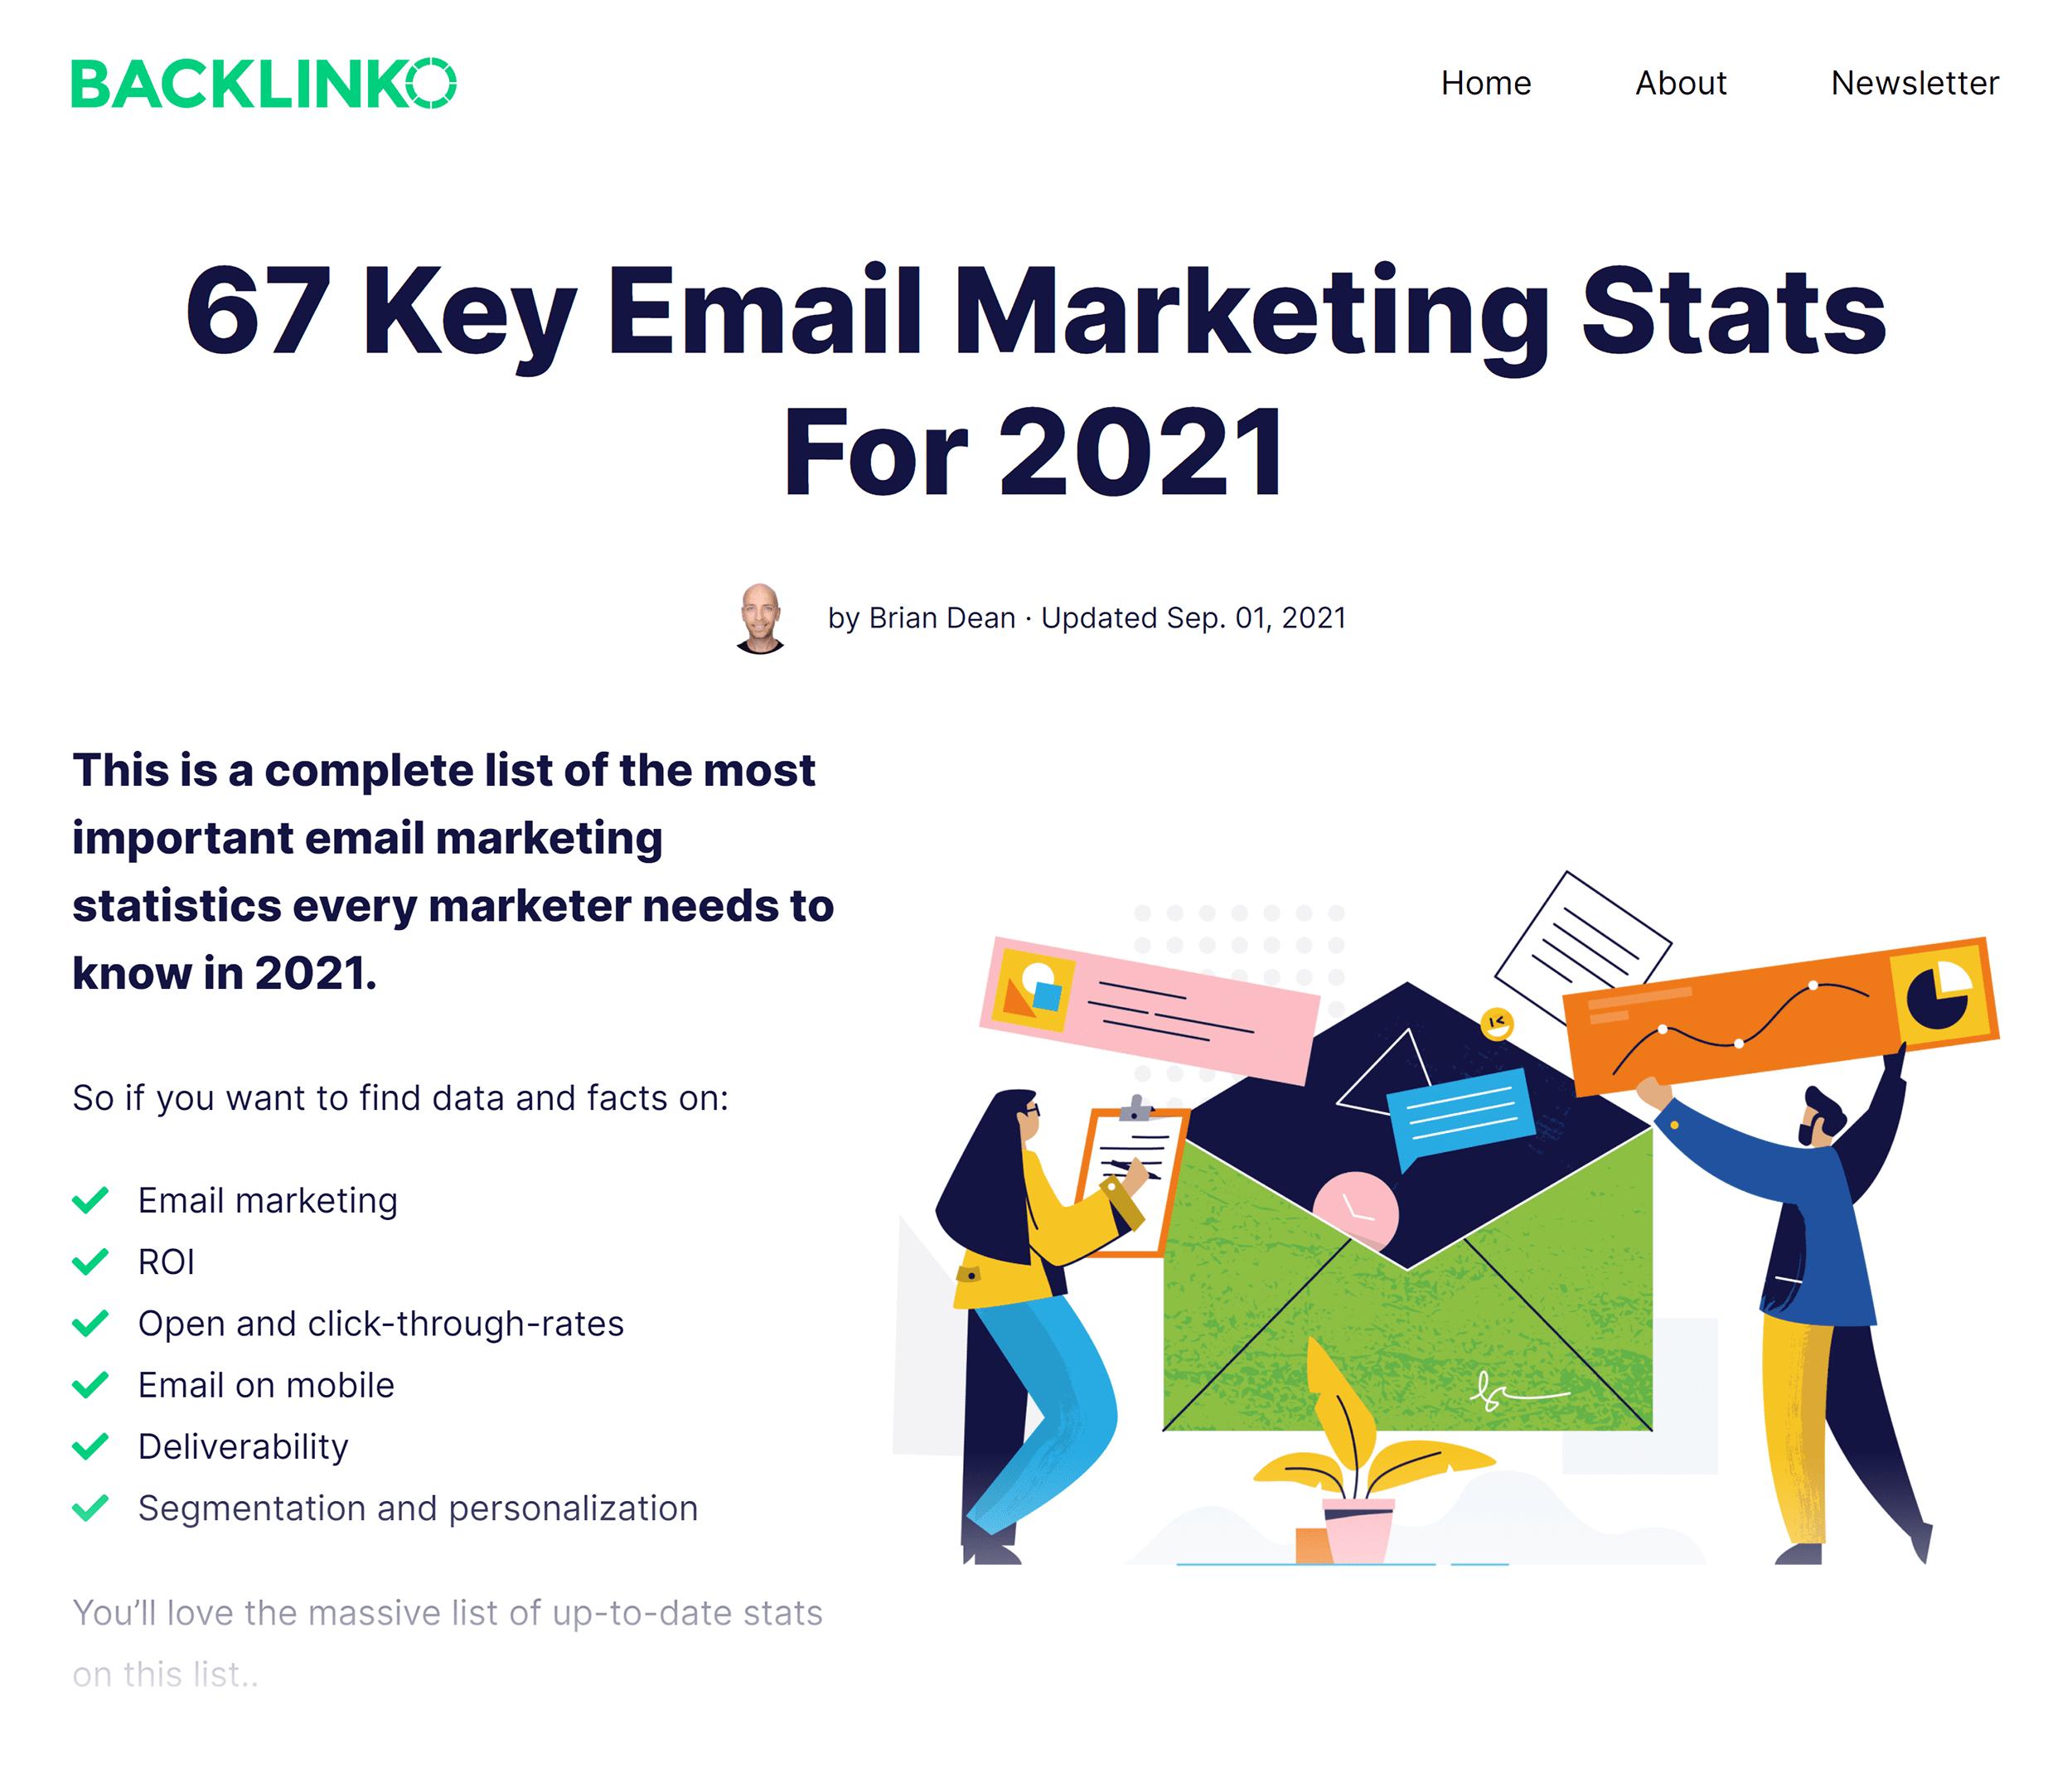 Backlinko – Email marketing stats